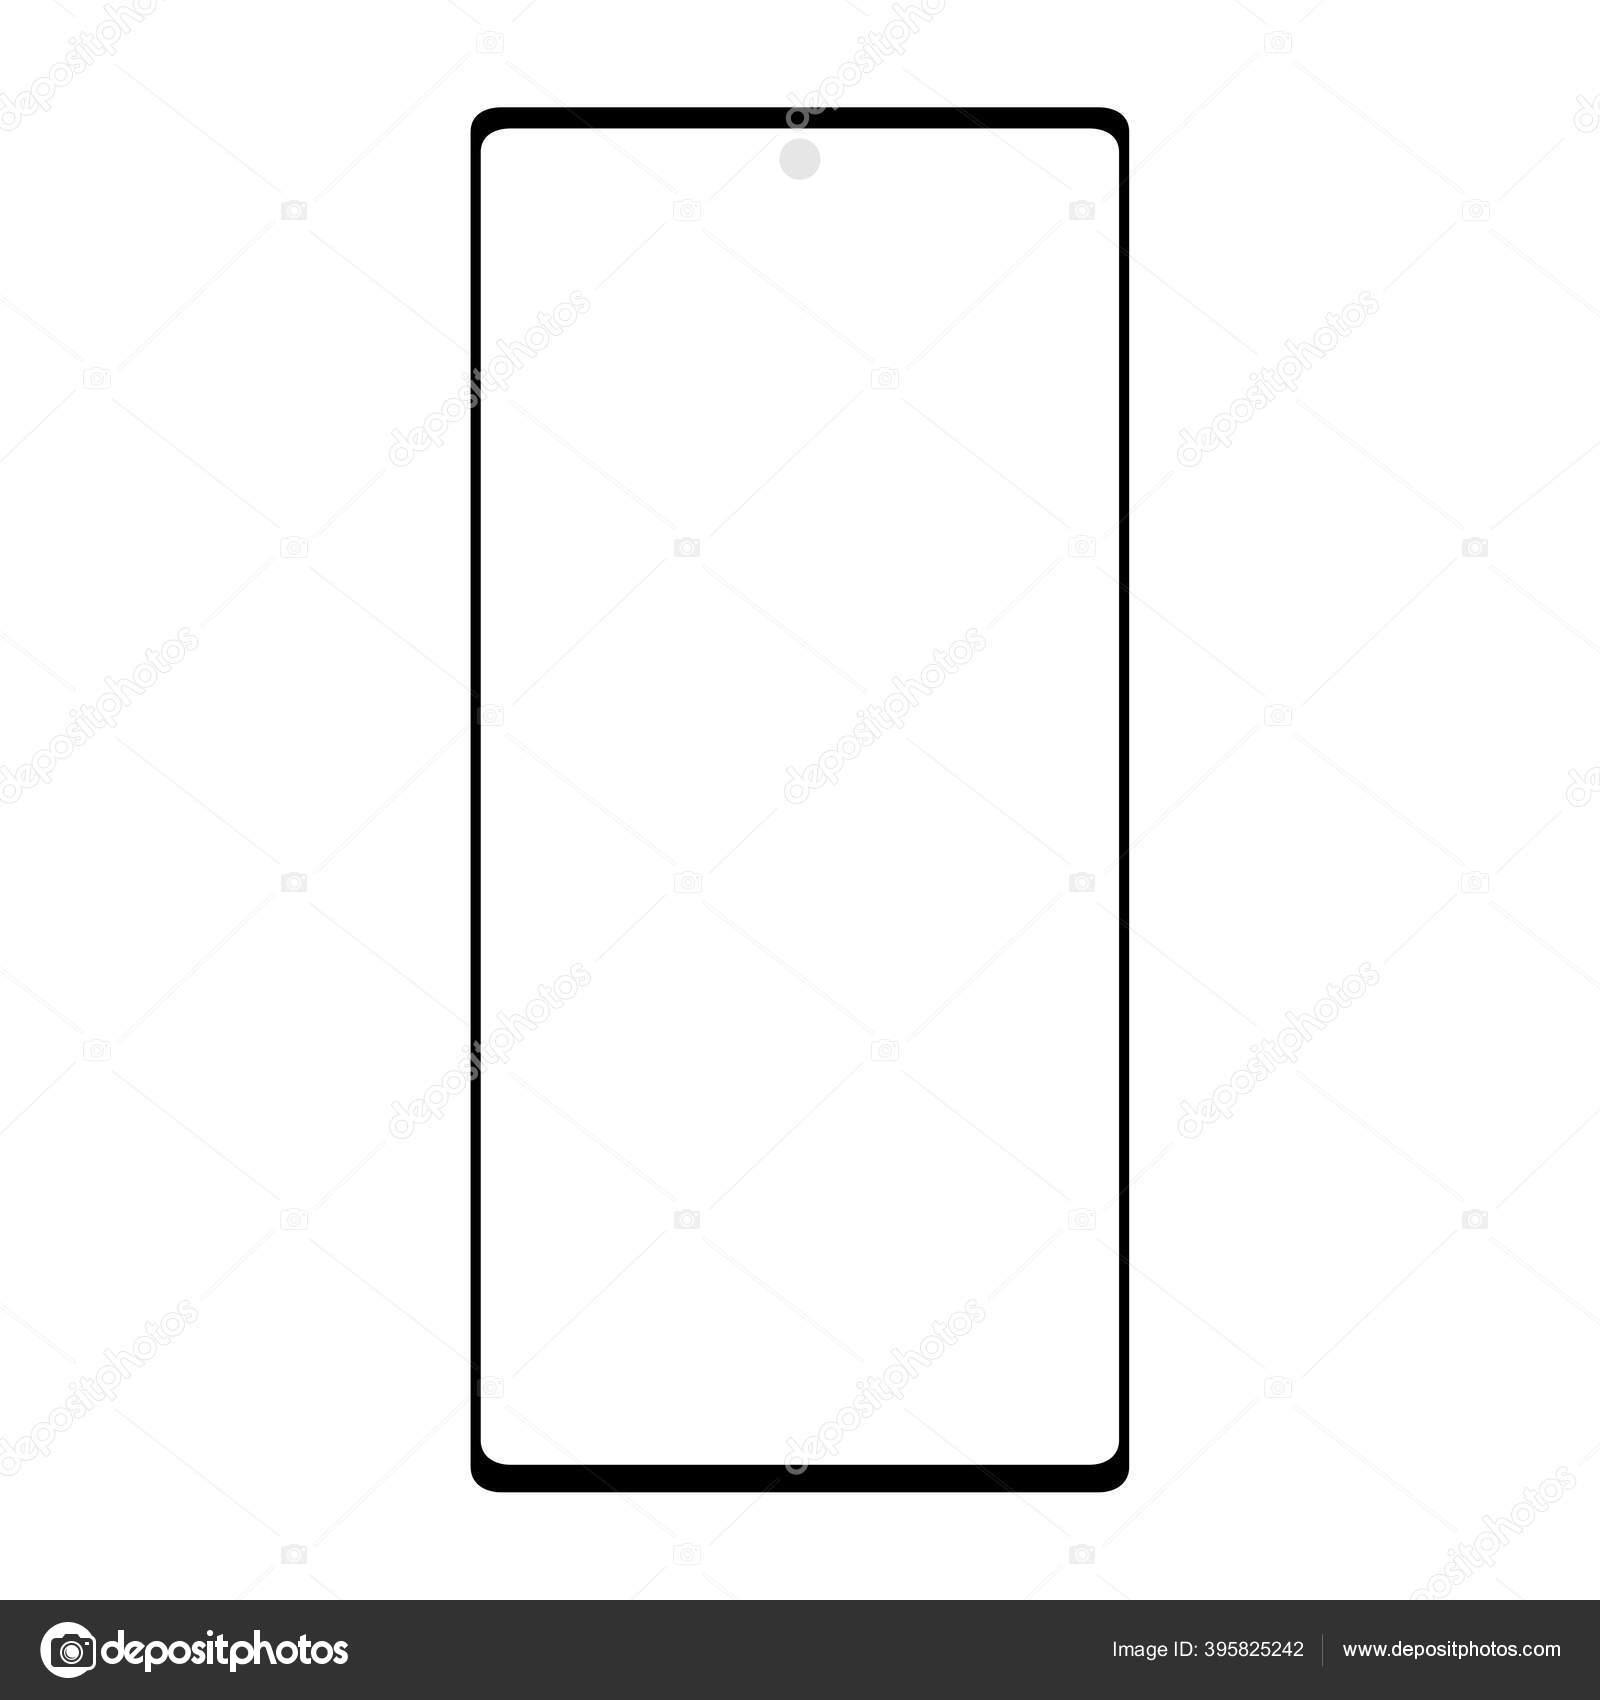 ikon smartphone pada gambar vektor latar belakang putih eps10 ponsel stok vektor c mycola adams 395825242 https id depositphotos com 395825242 stock illustration smartphone icon white background vector html